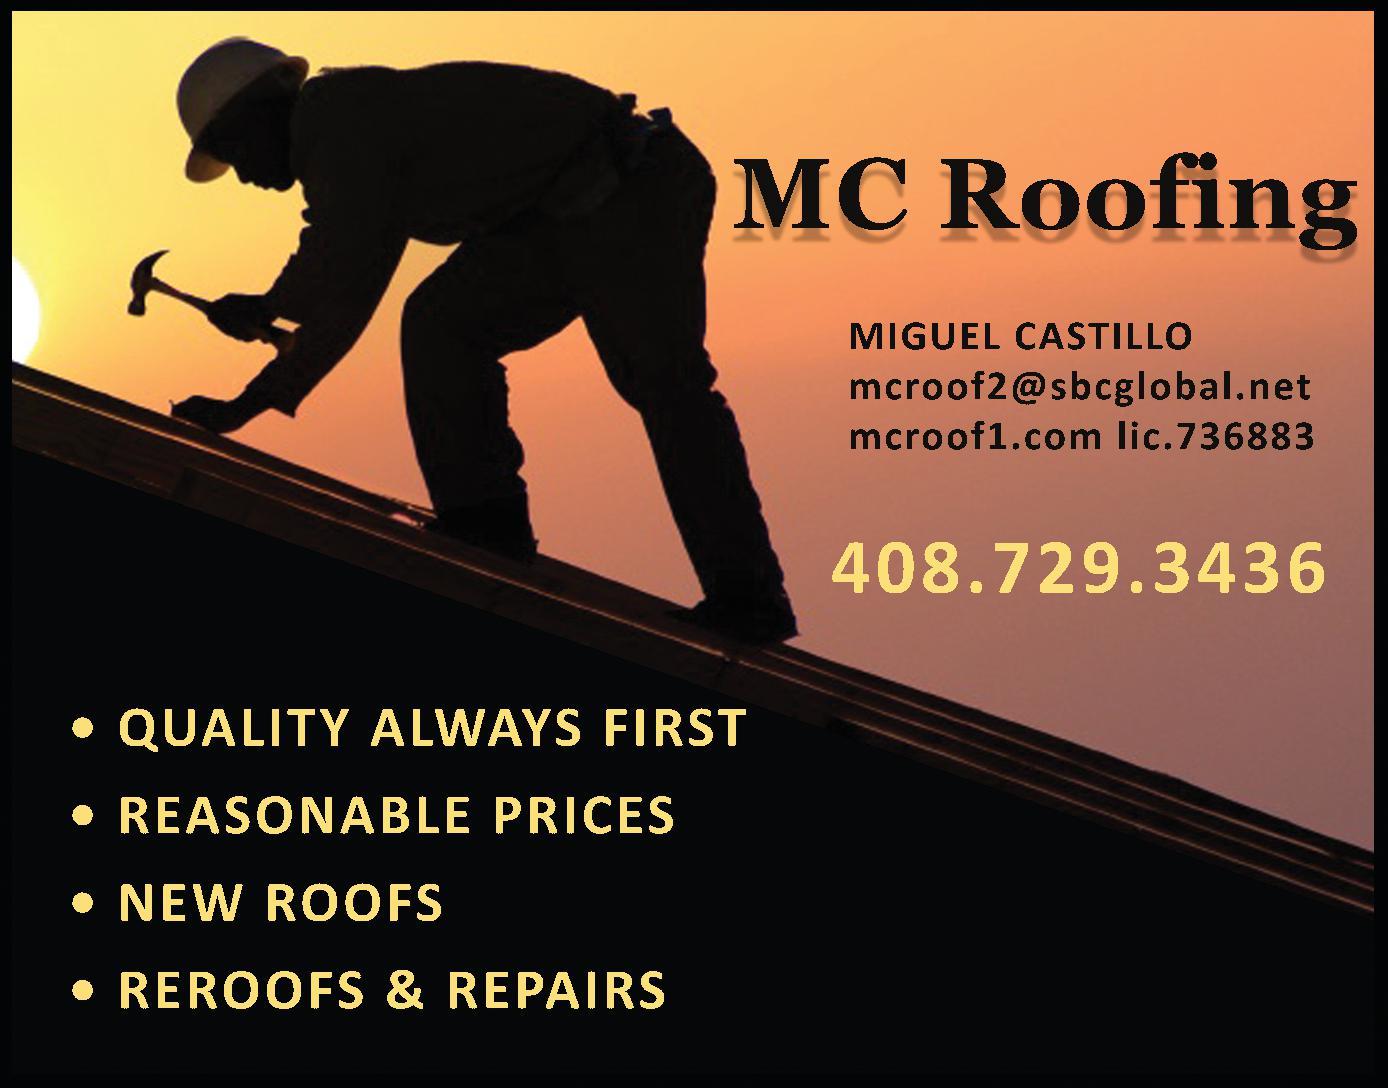 MC Roofing